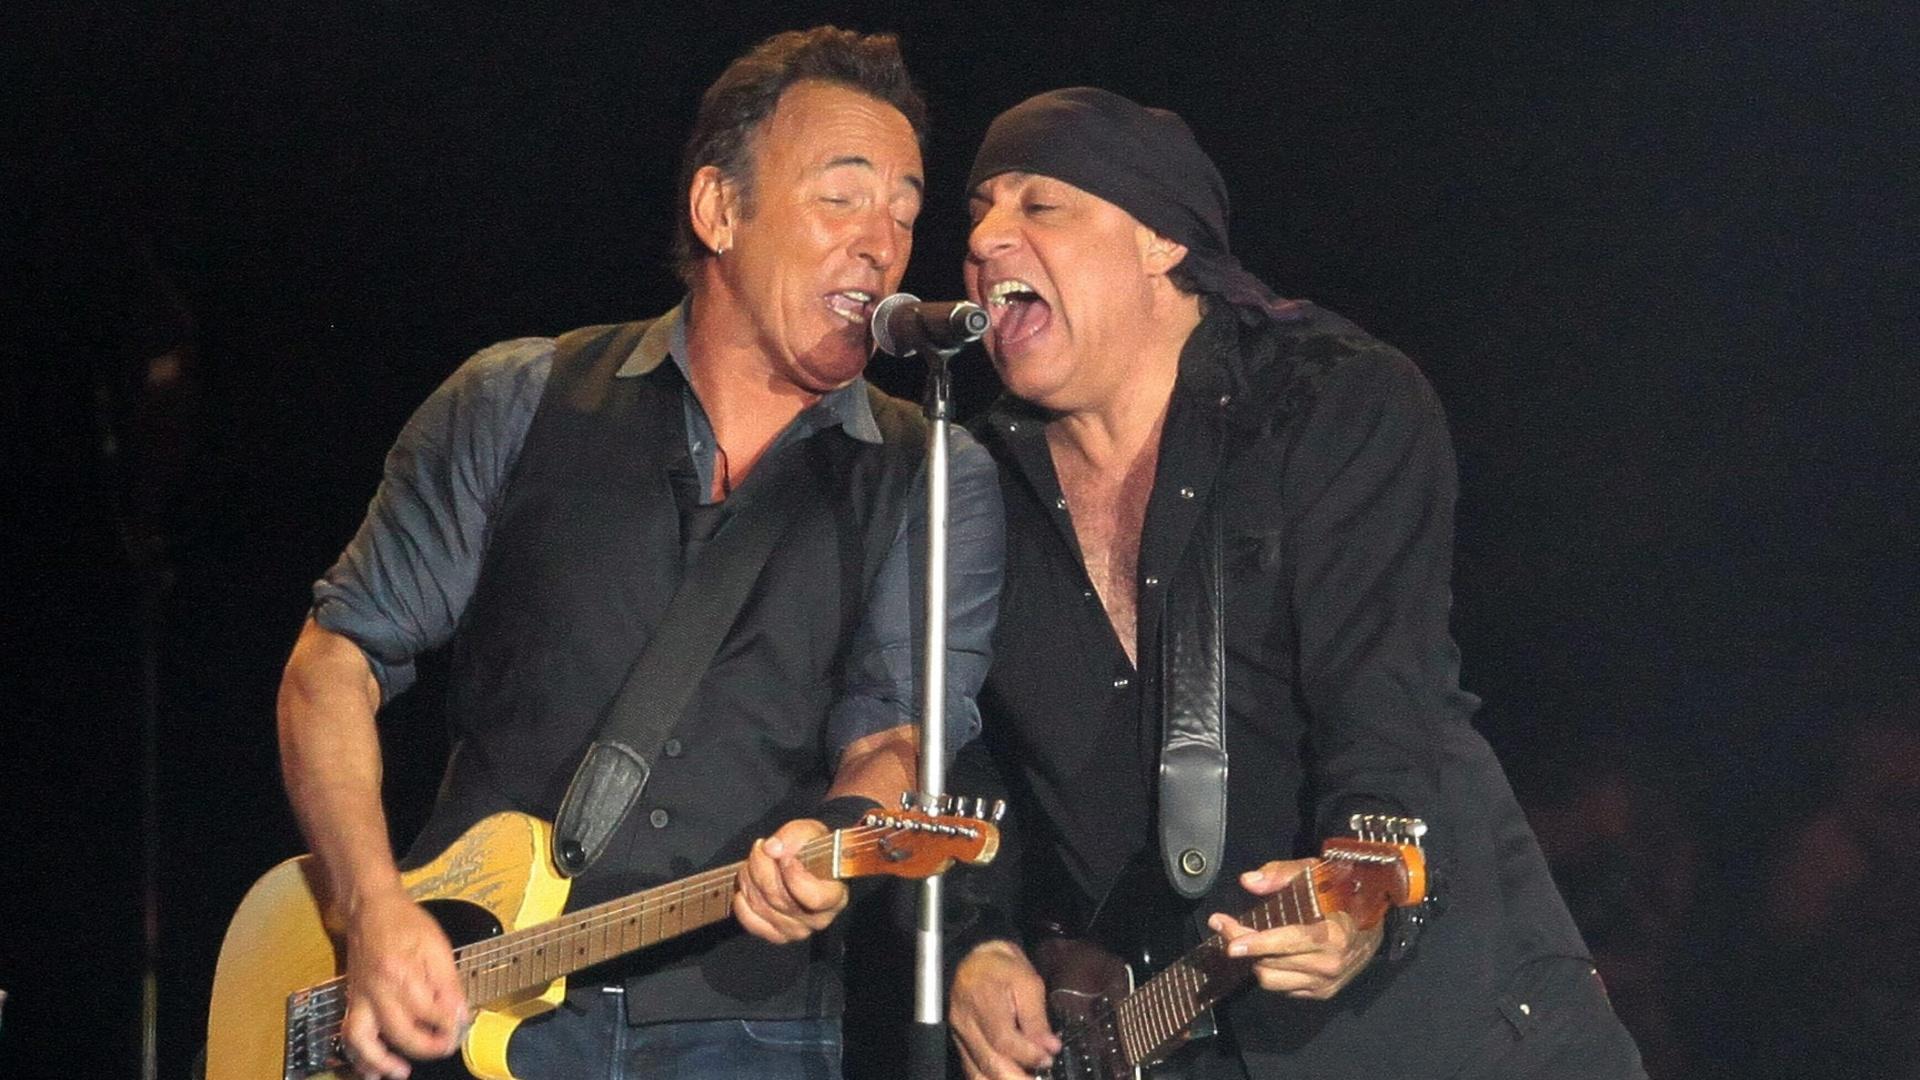 Bruce Springsteen e Steven Van Zandt cantam juntos no Rock in Rio Lisboa (3/6/12)